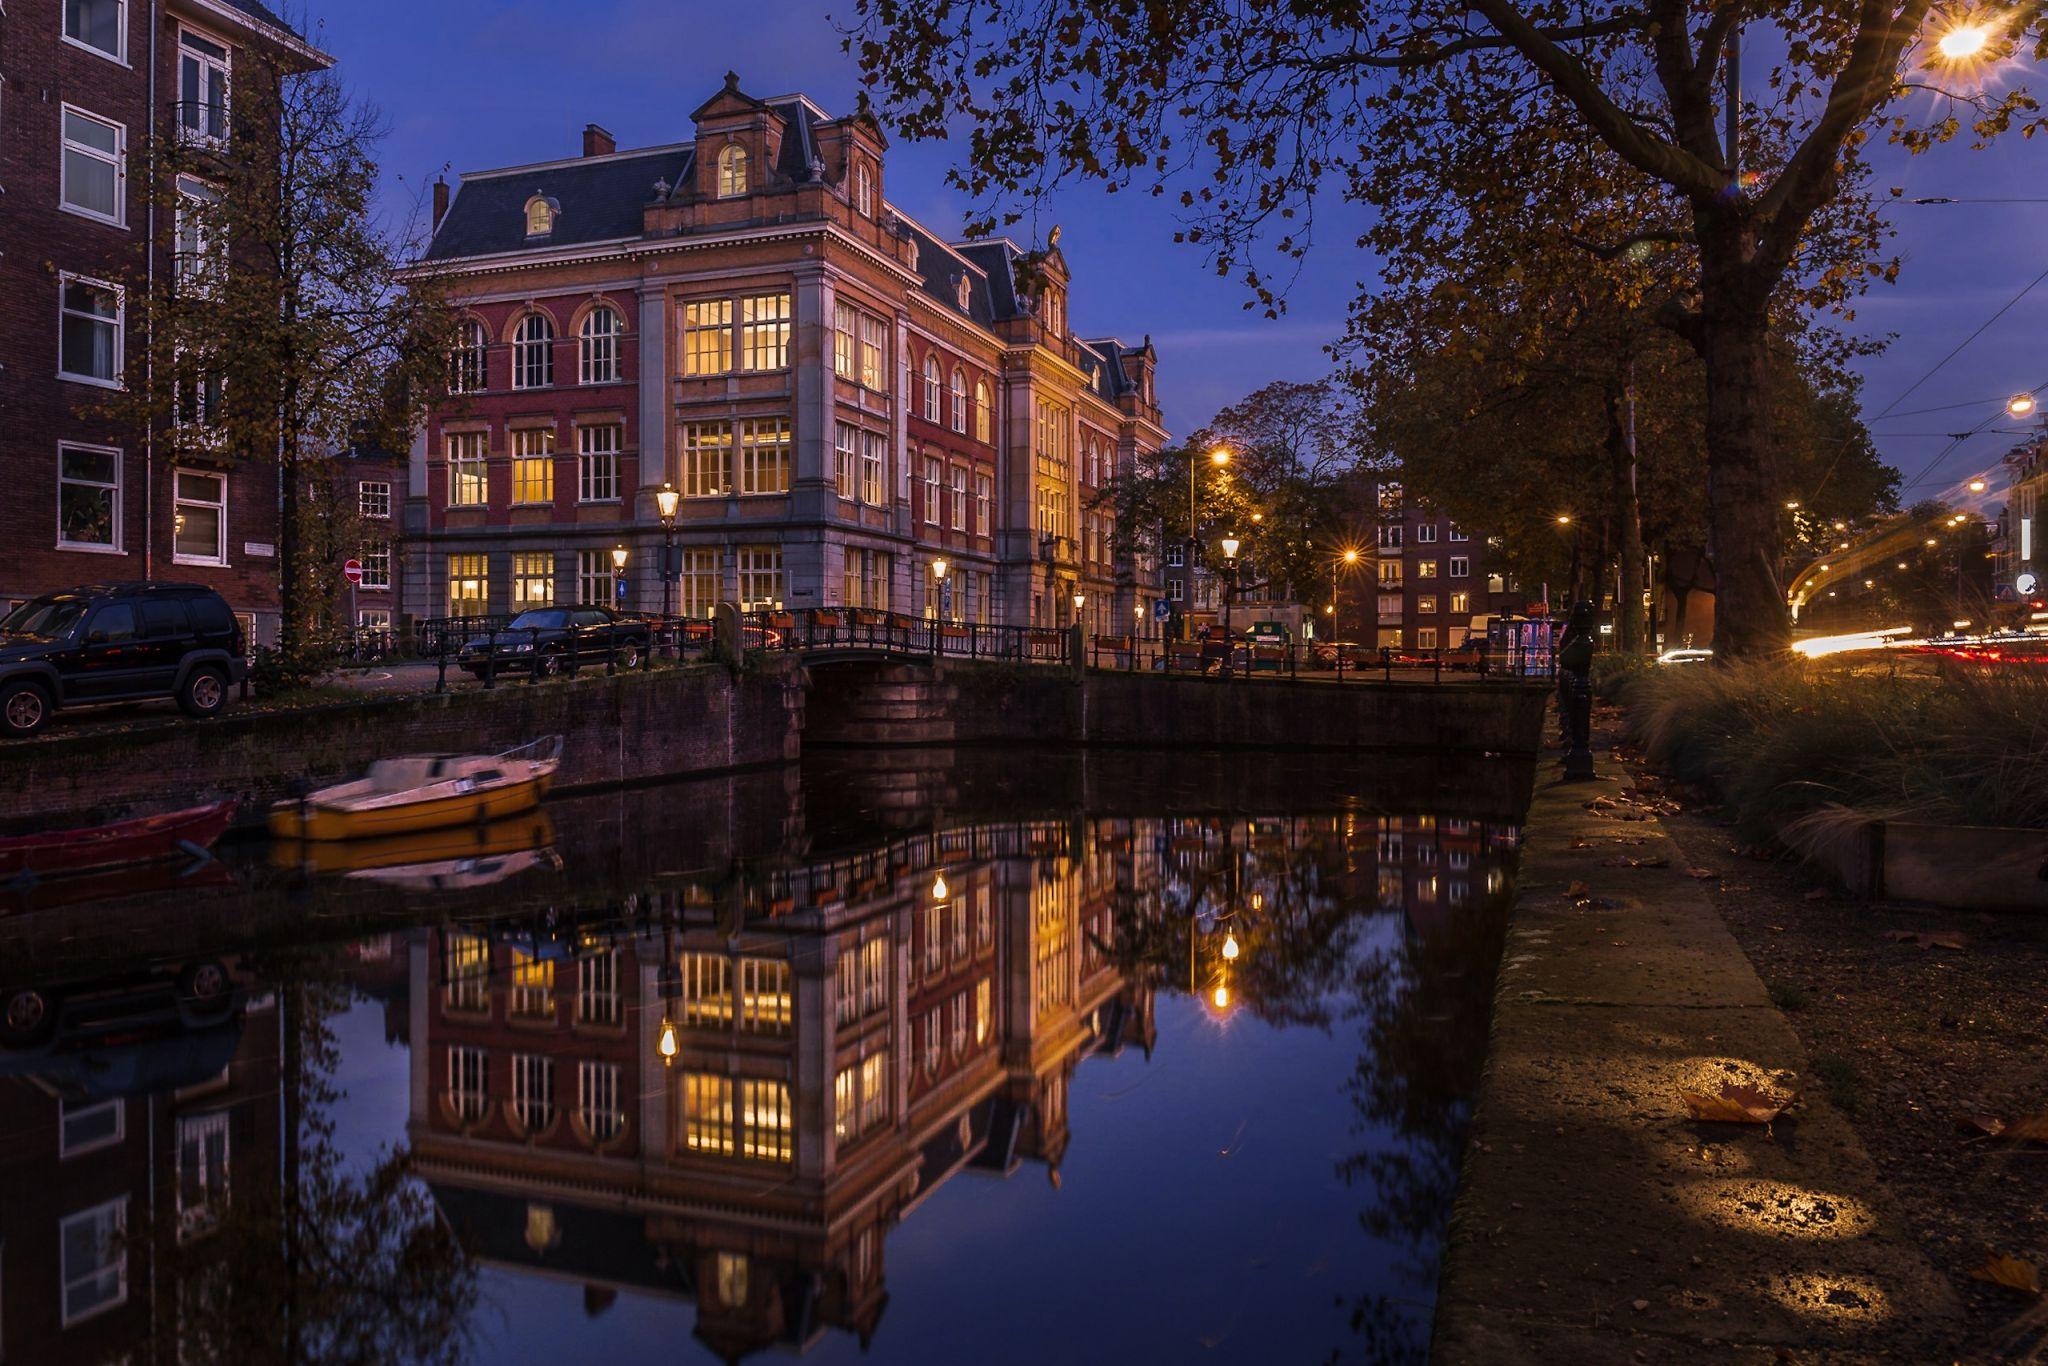 Raamplein Amsterdam, Netherlands